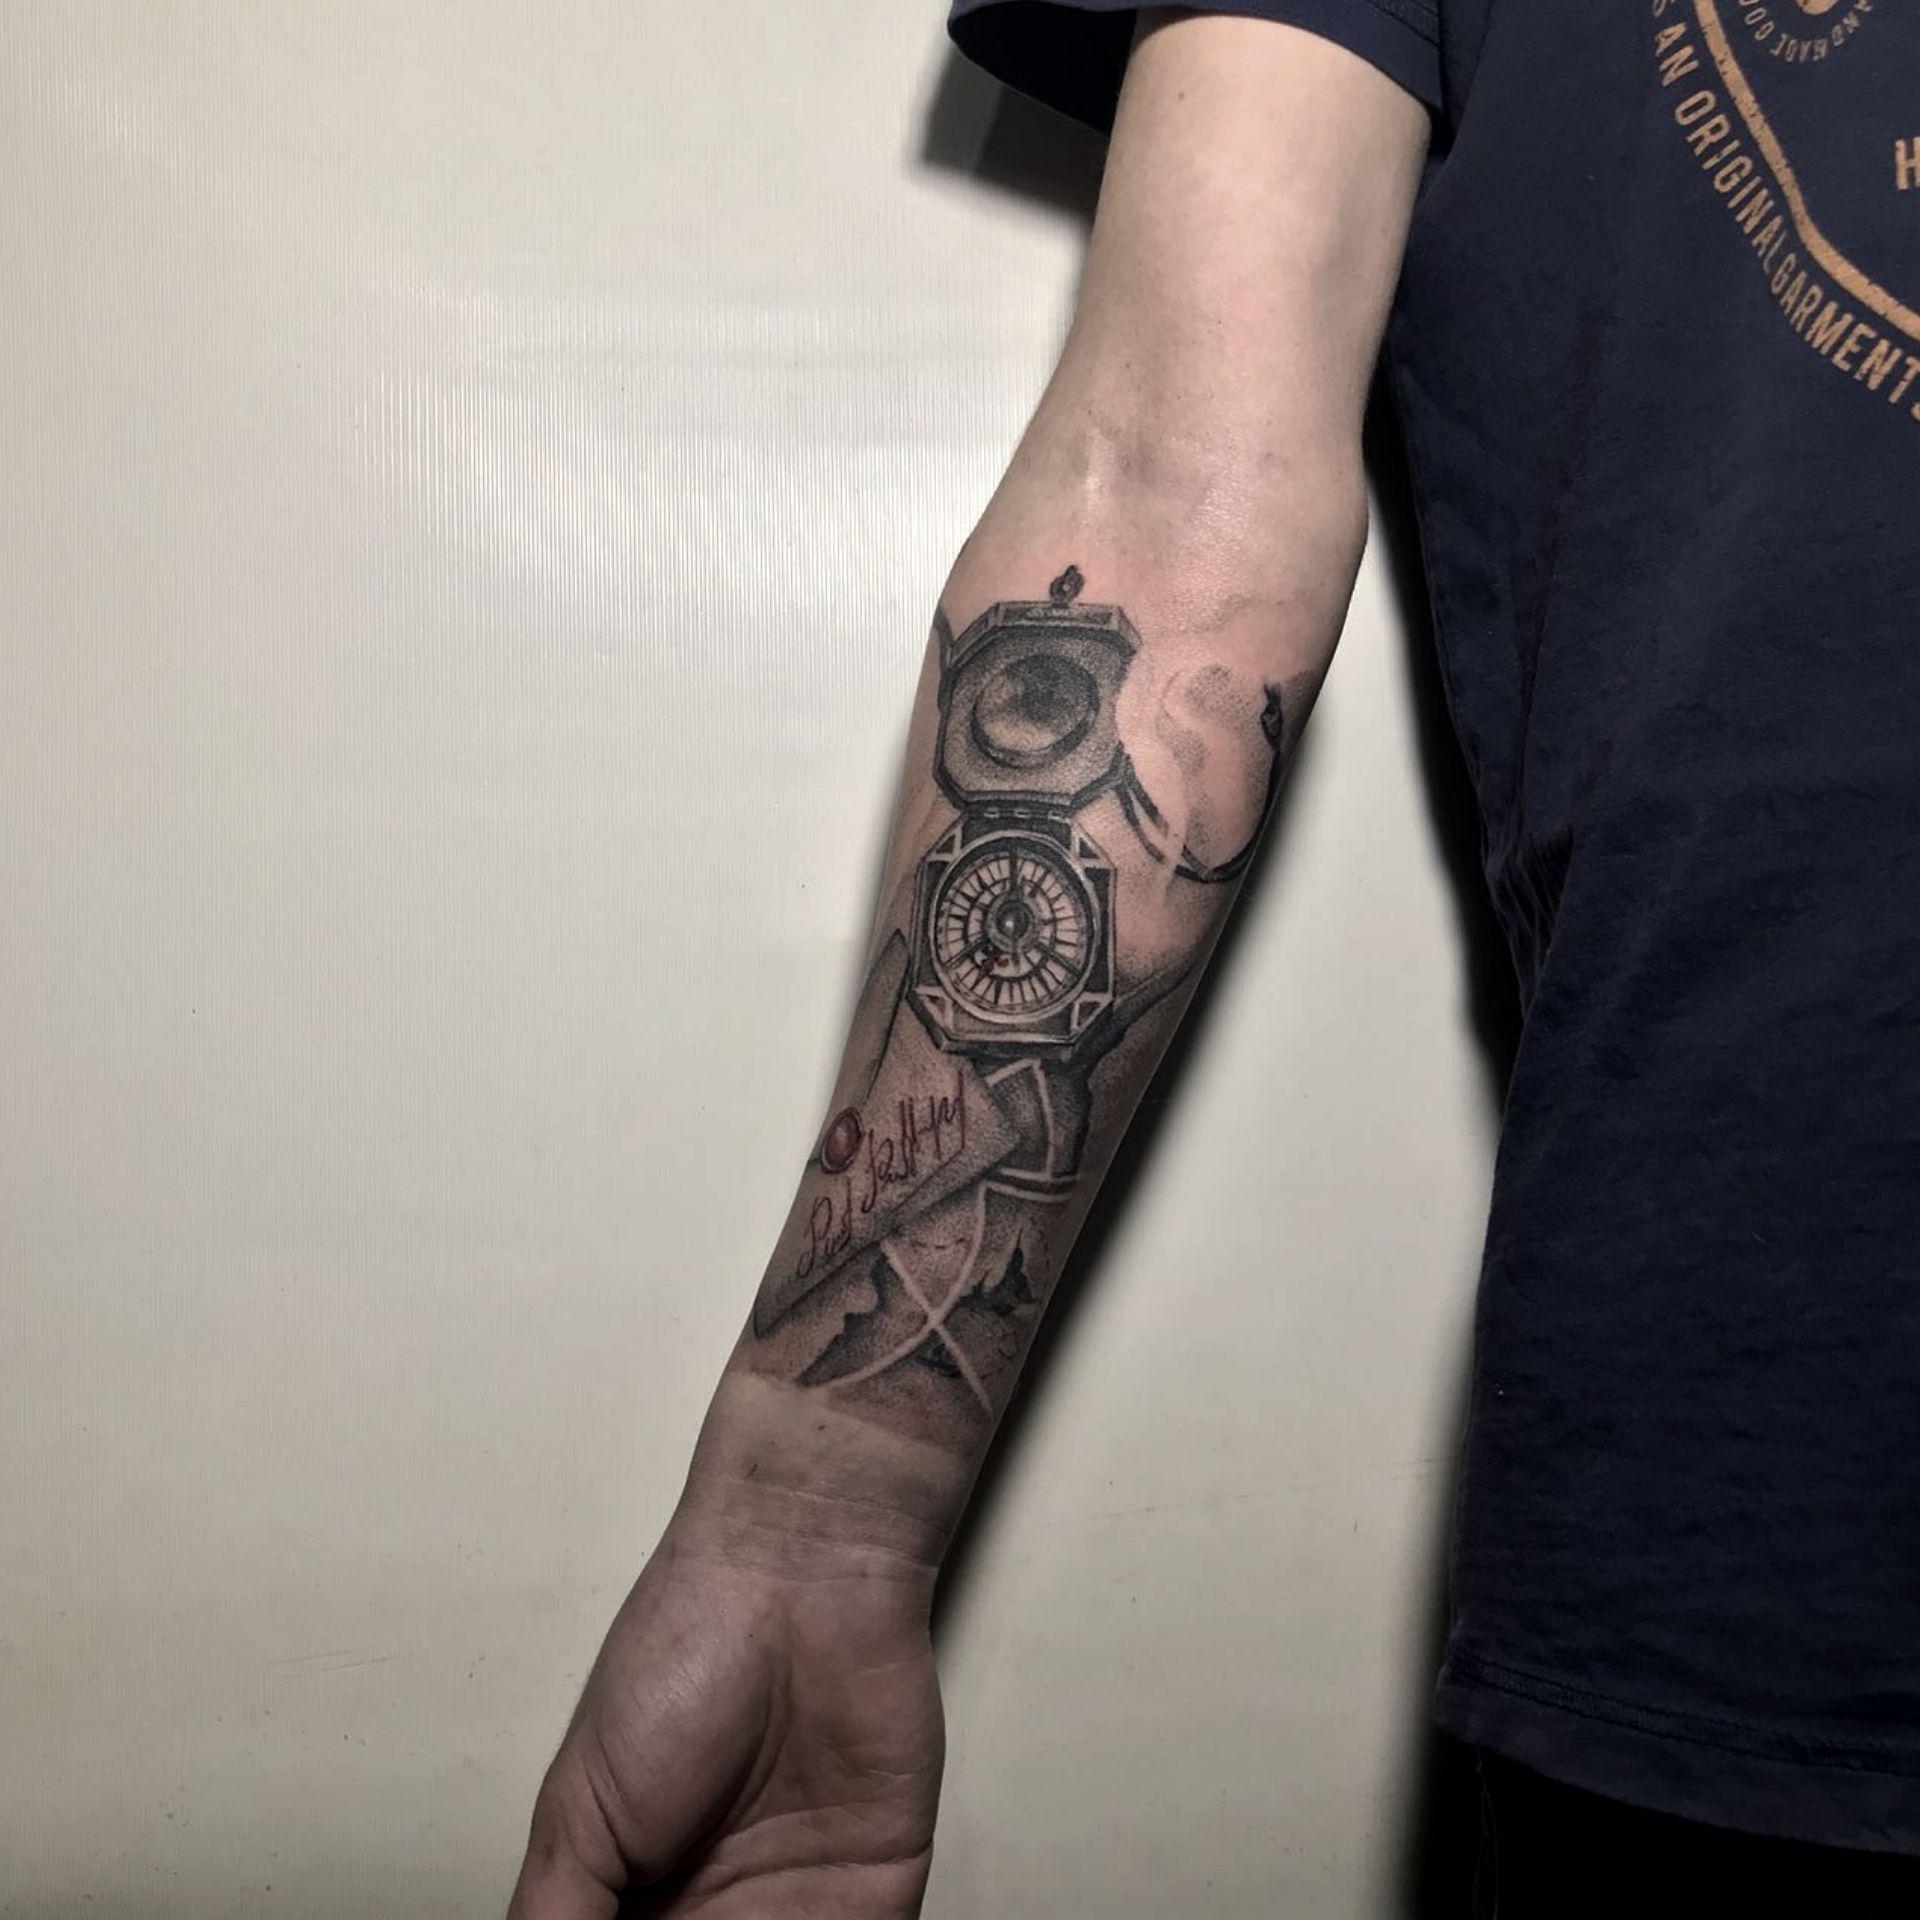 Tattoo Compass Map Letter тату компас письмо карта сокровища